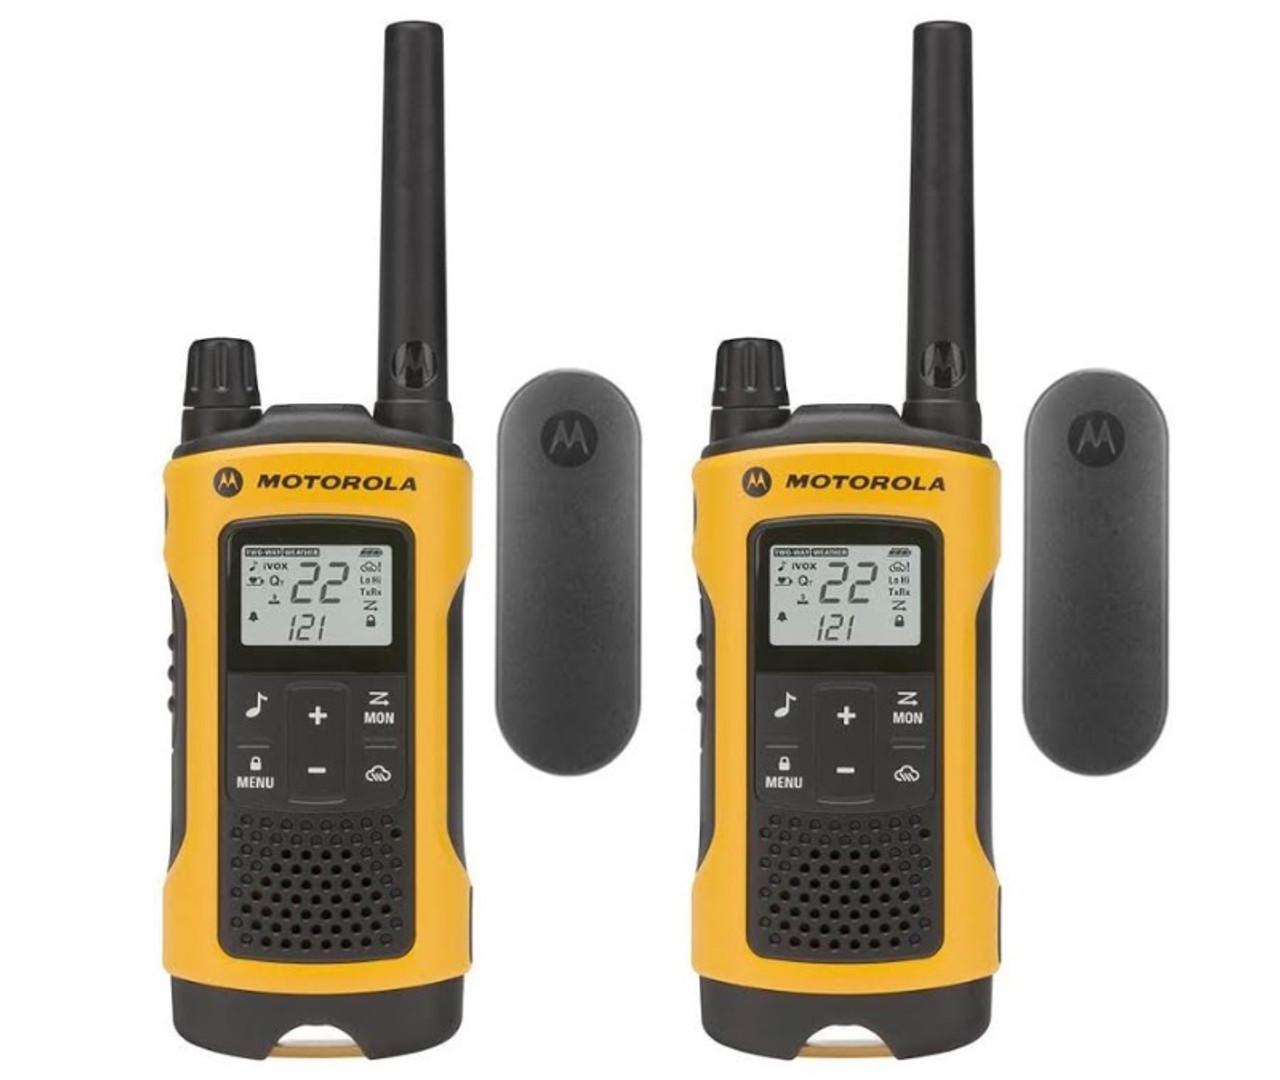 Motorola GMRS/FRS Talkabout T402 2-Way Radios